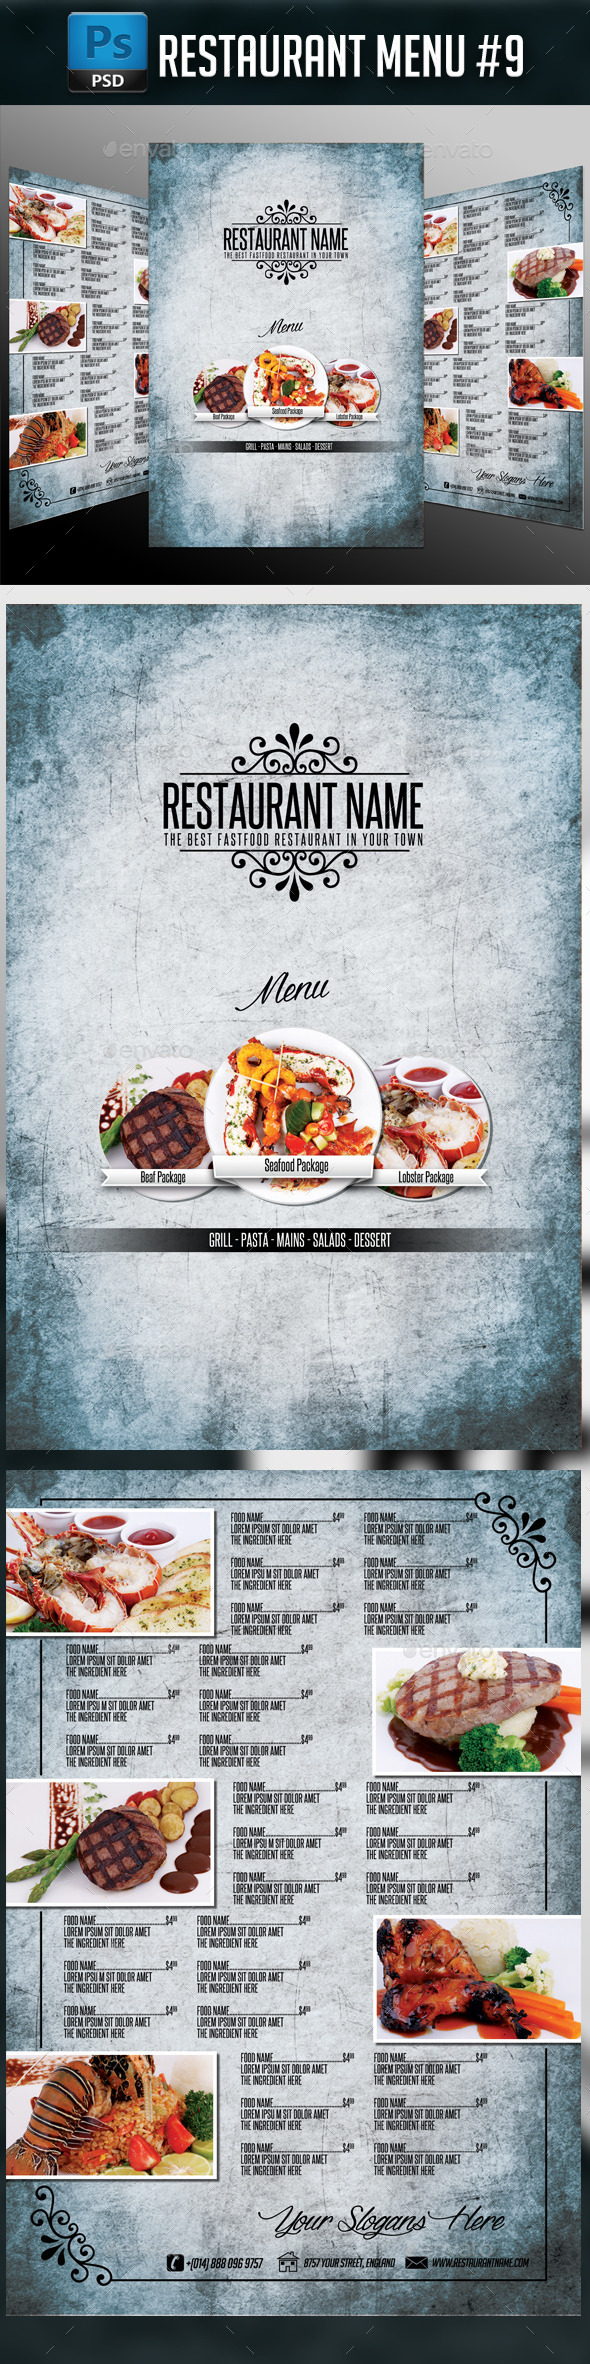 Restaurant Menu #9 - Food Menus Print Templates